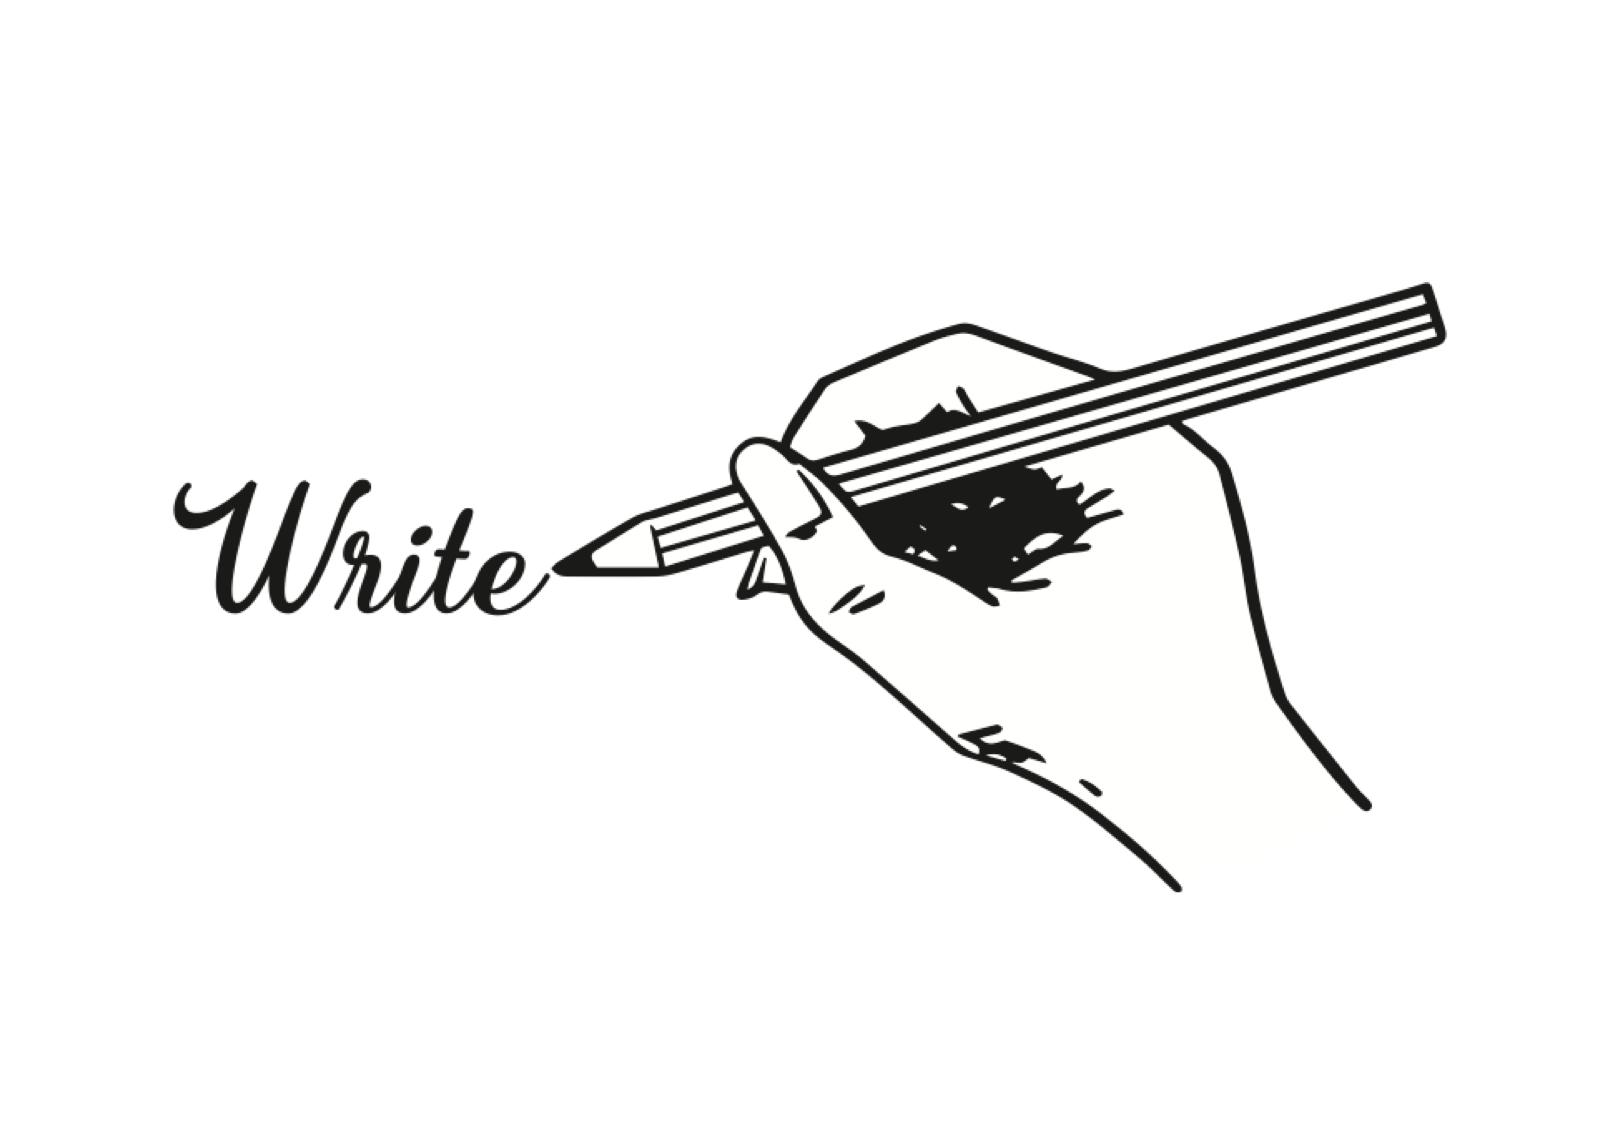 「White」と鉛筆で書くイラスト